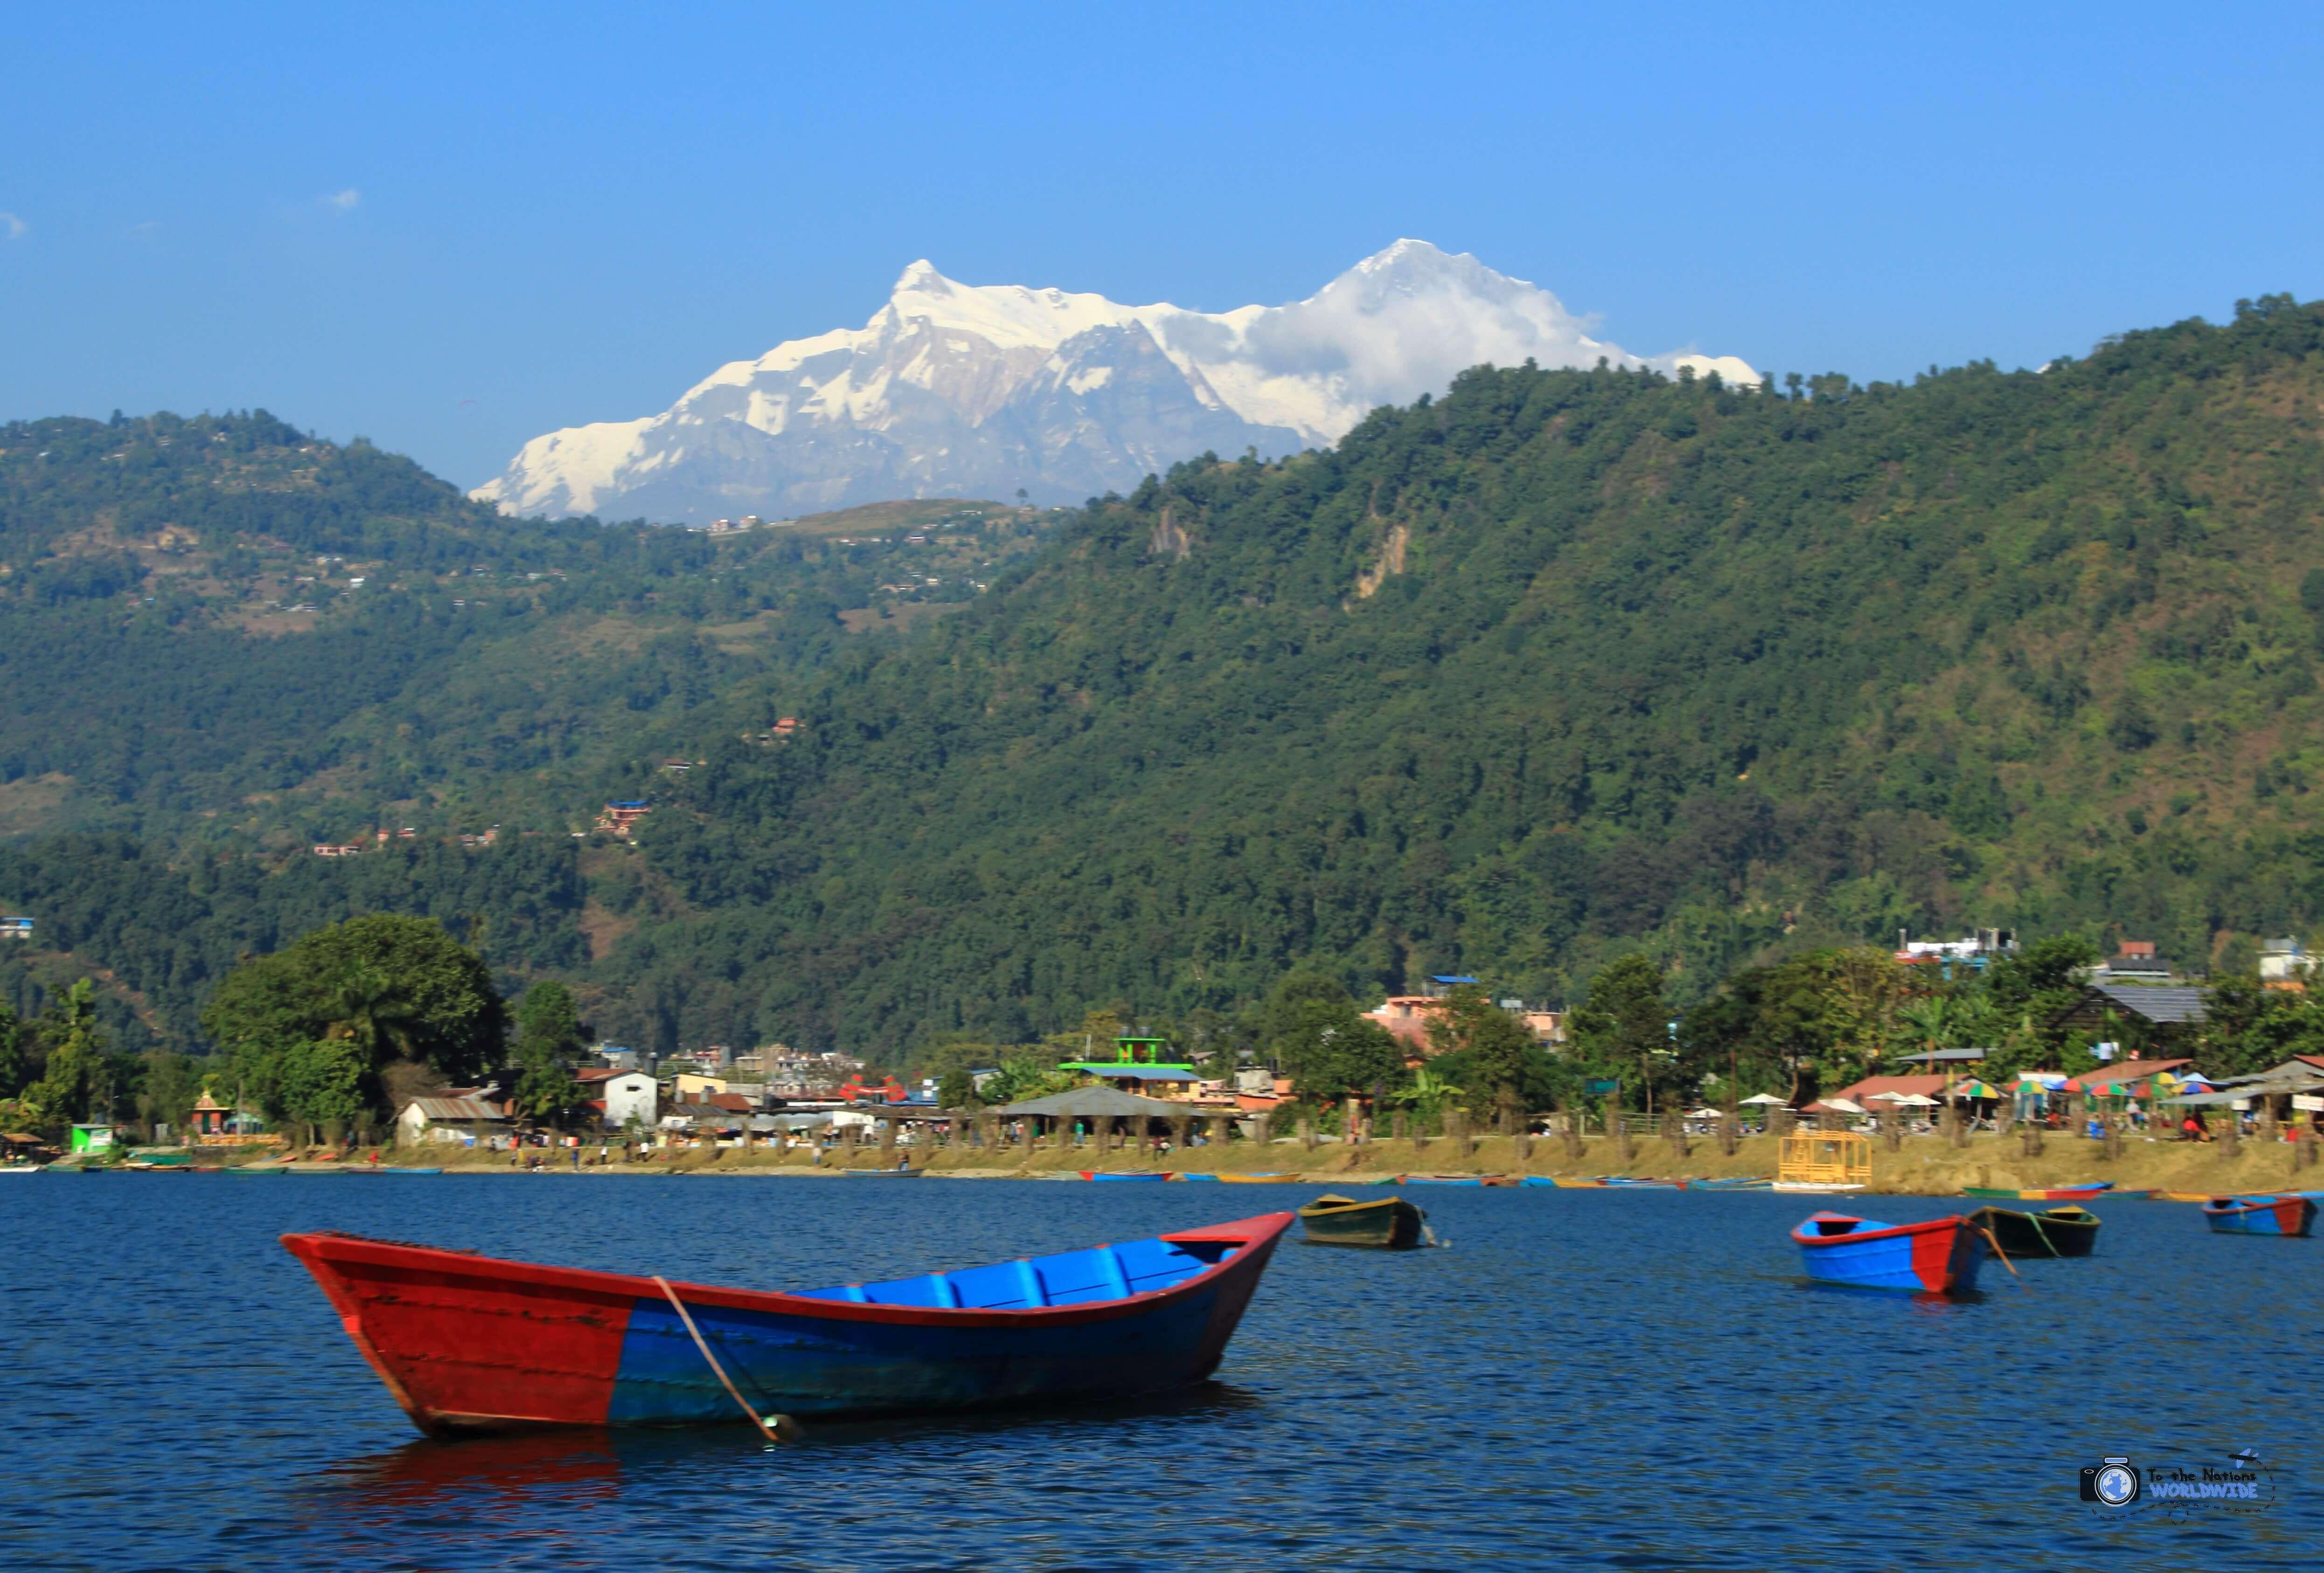 Phewa Lake, Pokhara, Nepal with the Annapurna Mountain Range in the Background